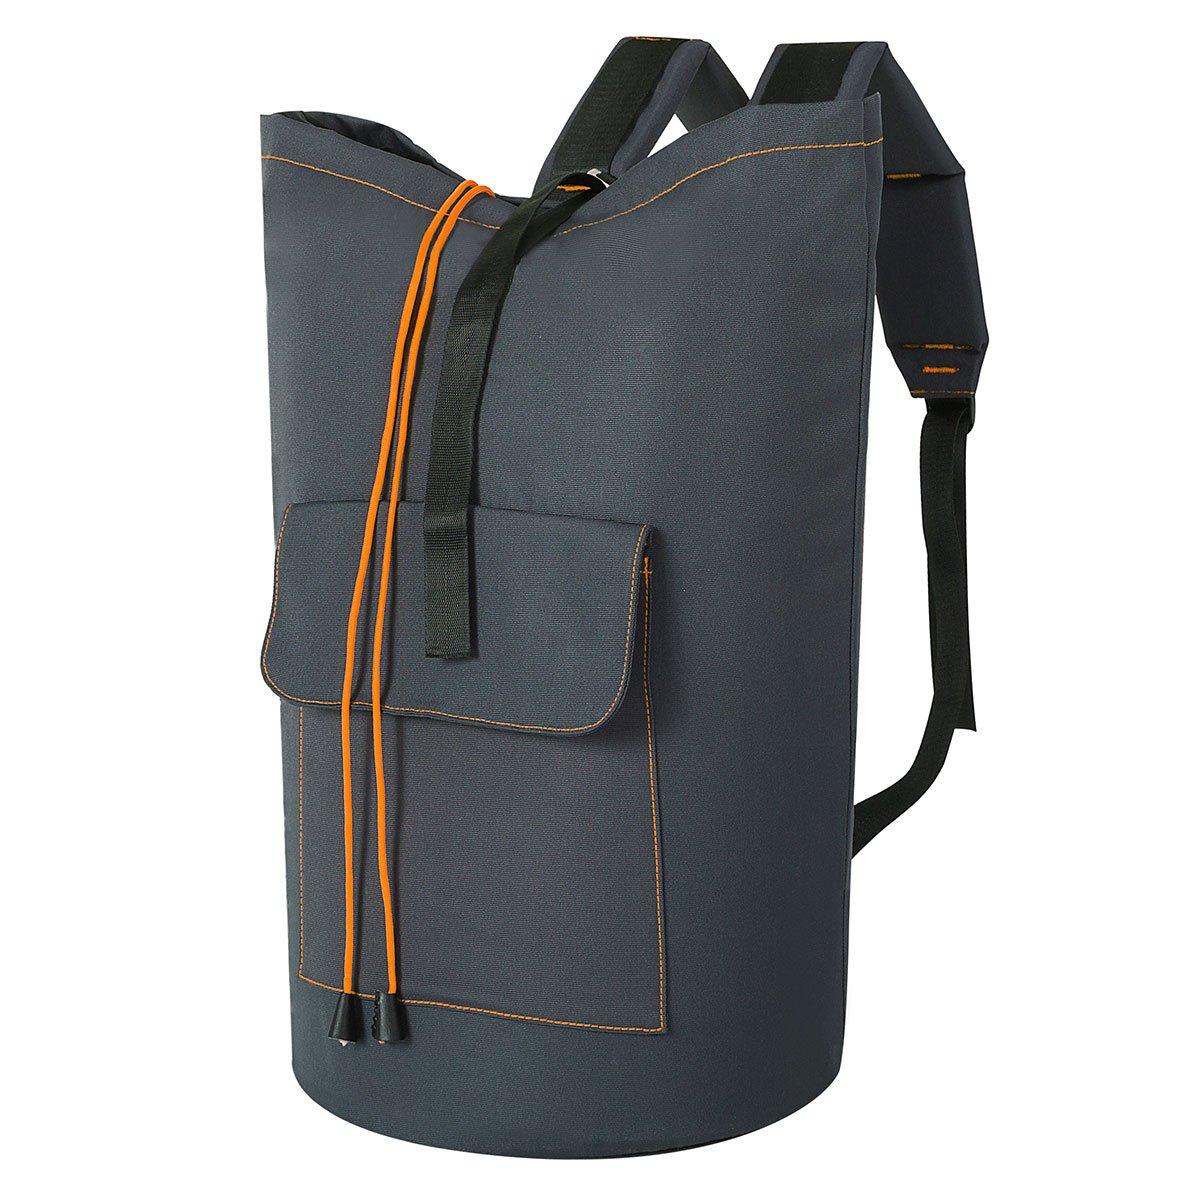 ZERO JET LAG Large Laundry Bag Laundry Hamper Travel Laundry Bag Hanging Waterproof Mesh Cover Durable Storage Bag Collage Dorm Sports (Dark Grey)